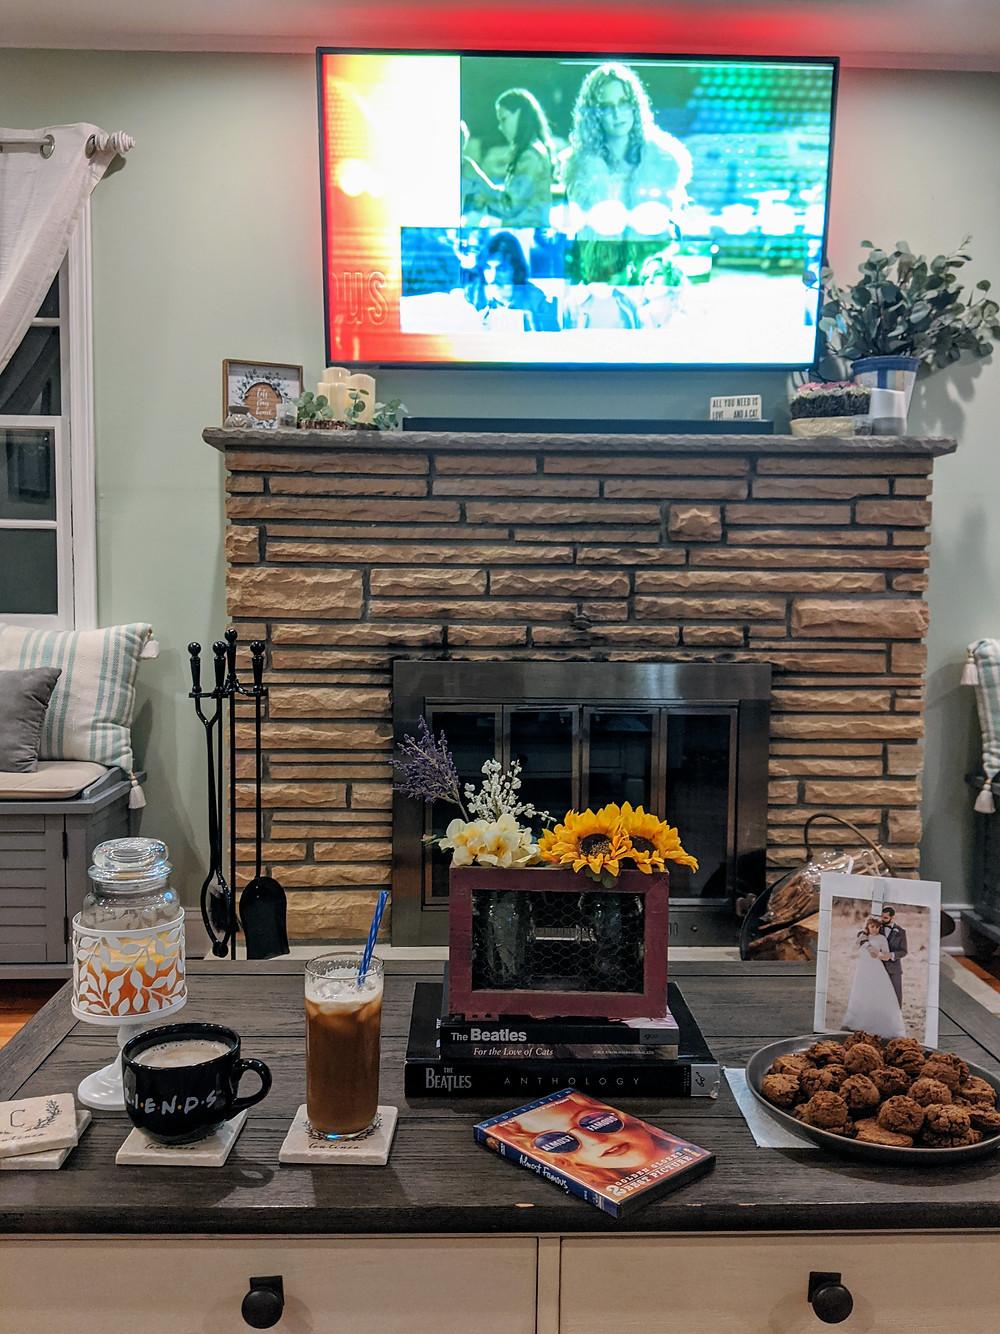 movie night - Our At-Home Date Night Game - Amanda MacGregor - joseph centineo